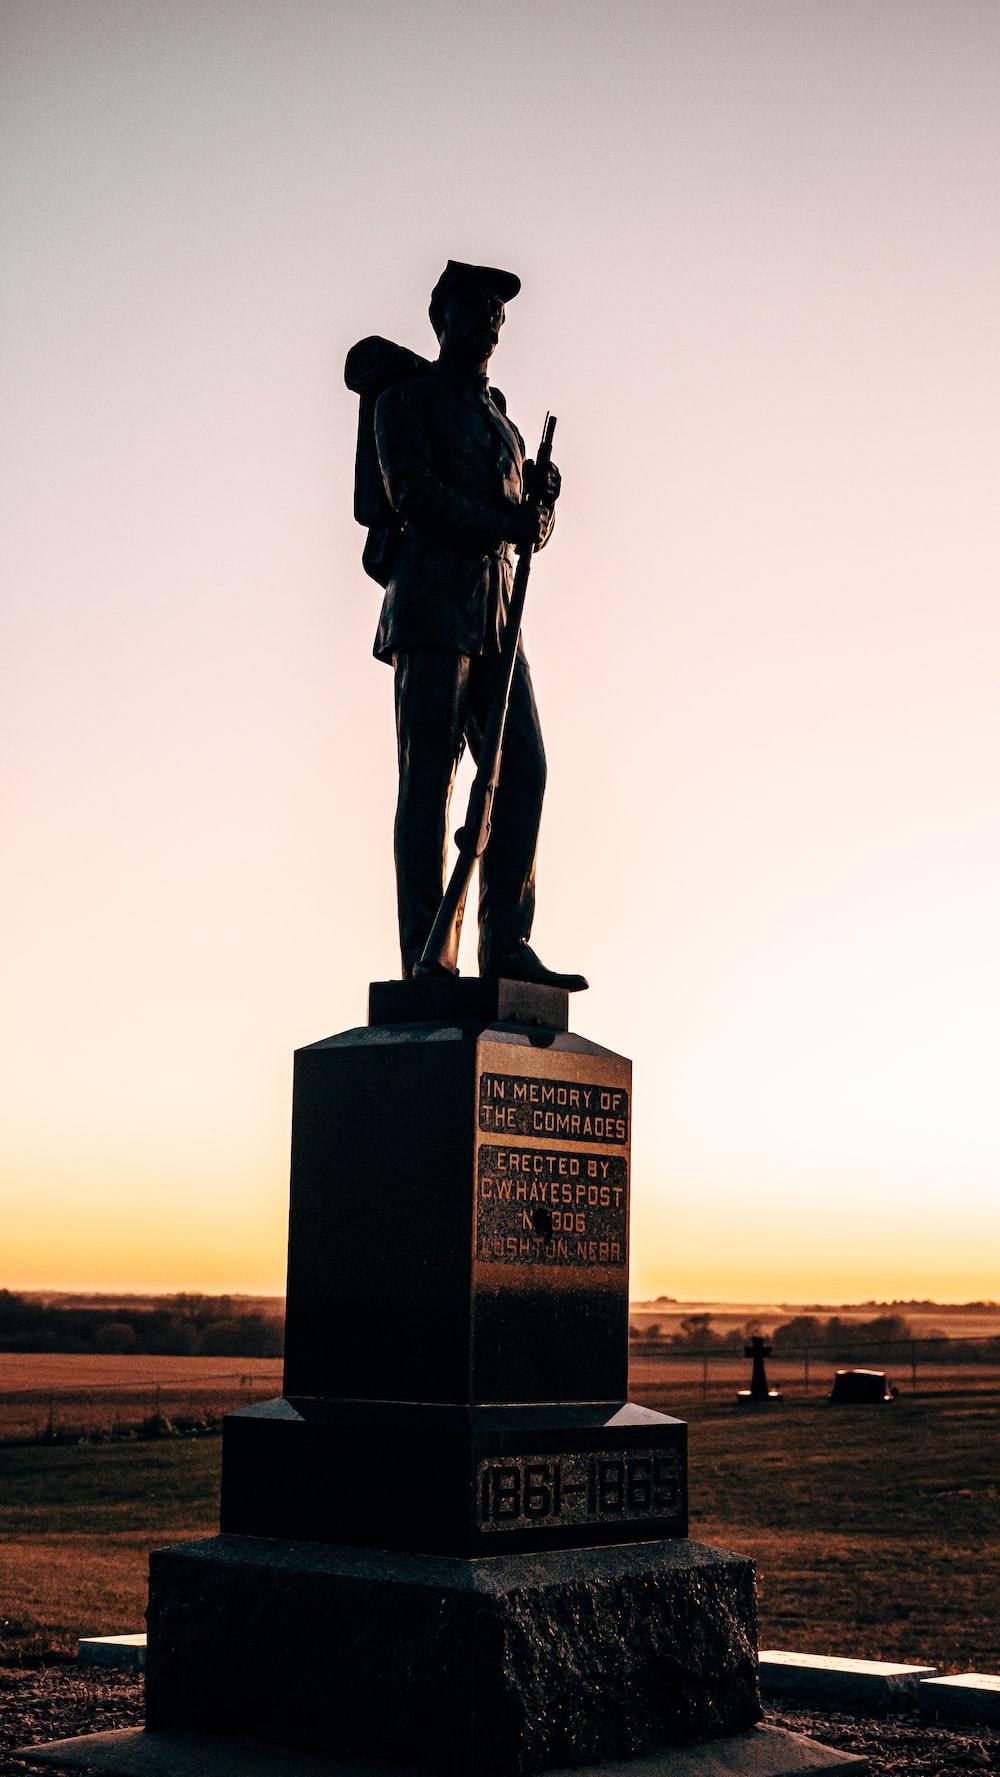 man holding rifle statue during daytime